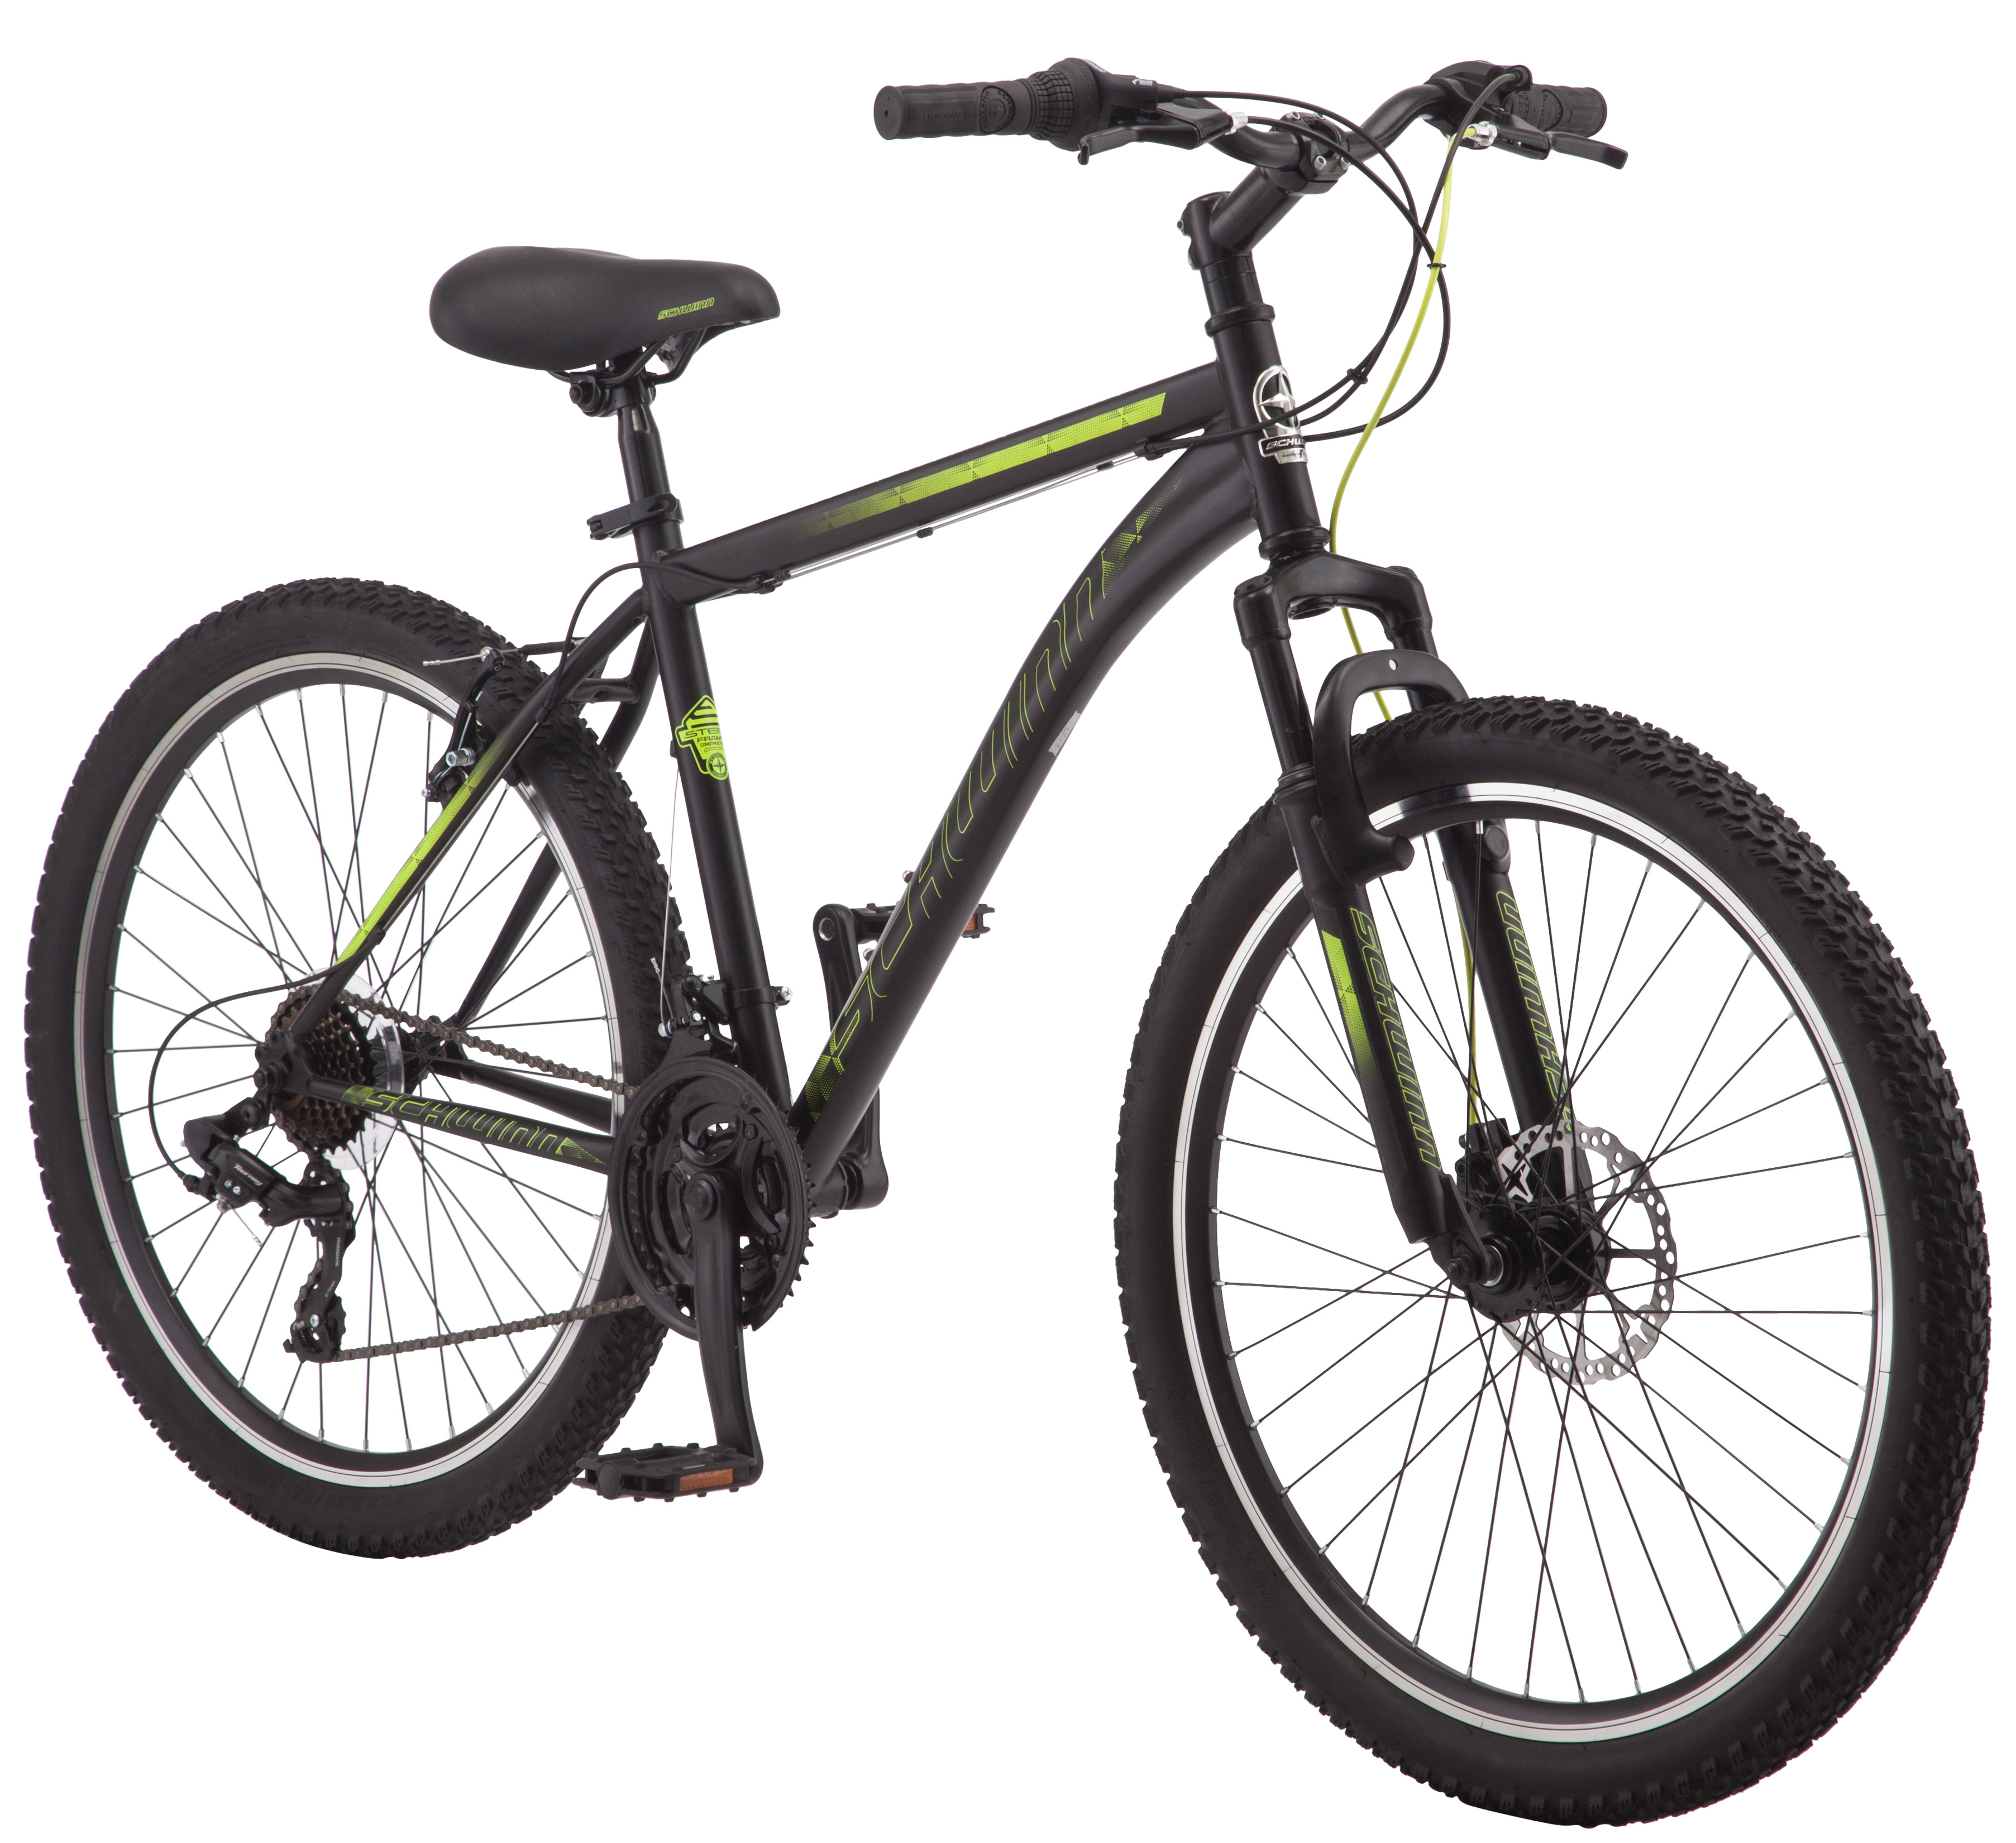 "Click here to buy 26"" Mens Schwinn Sidewinder Bike by Pacific Cycle."